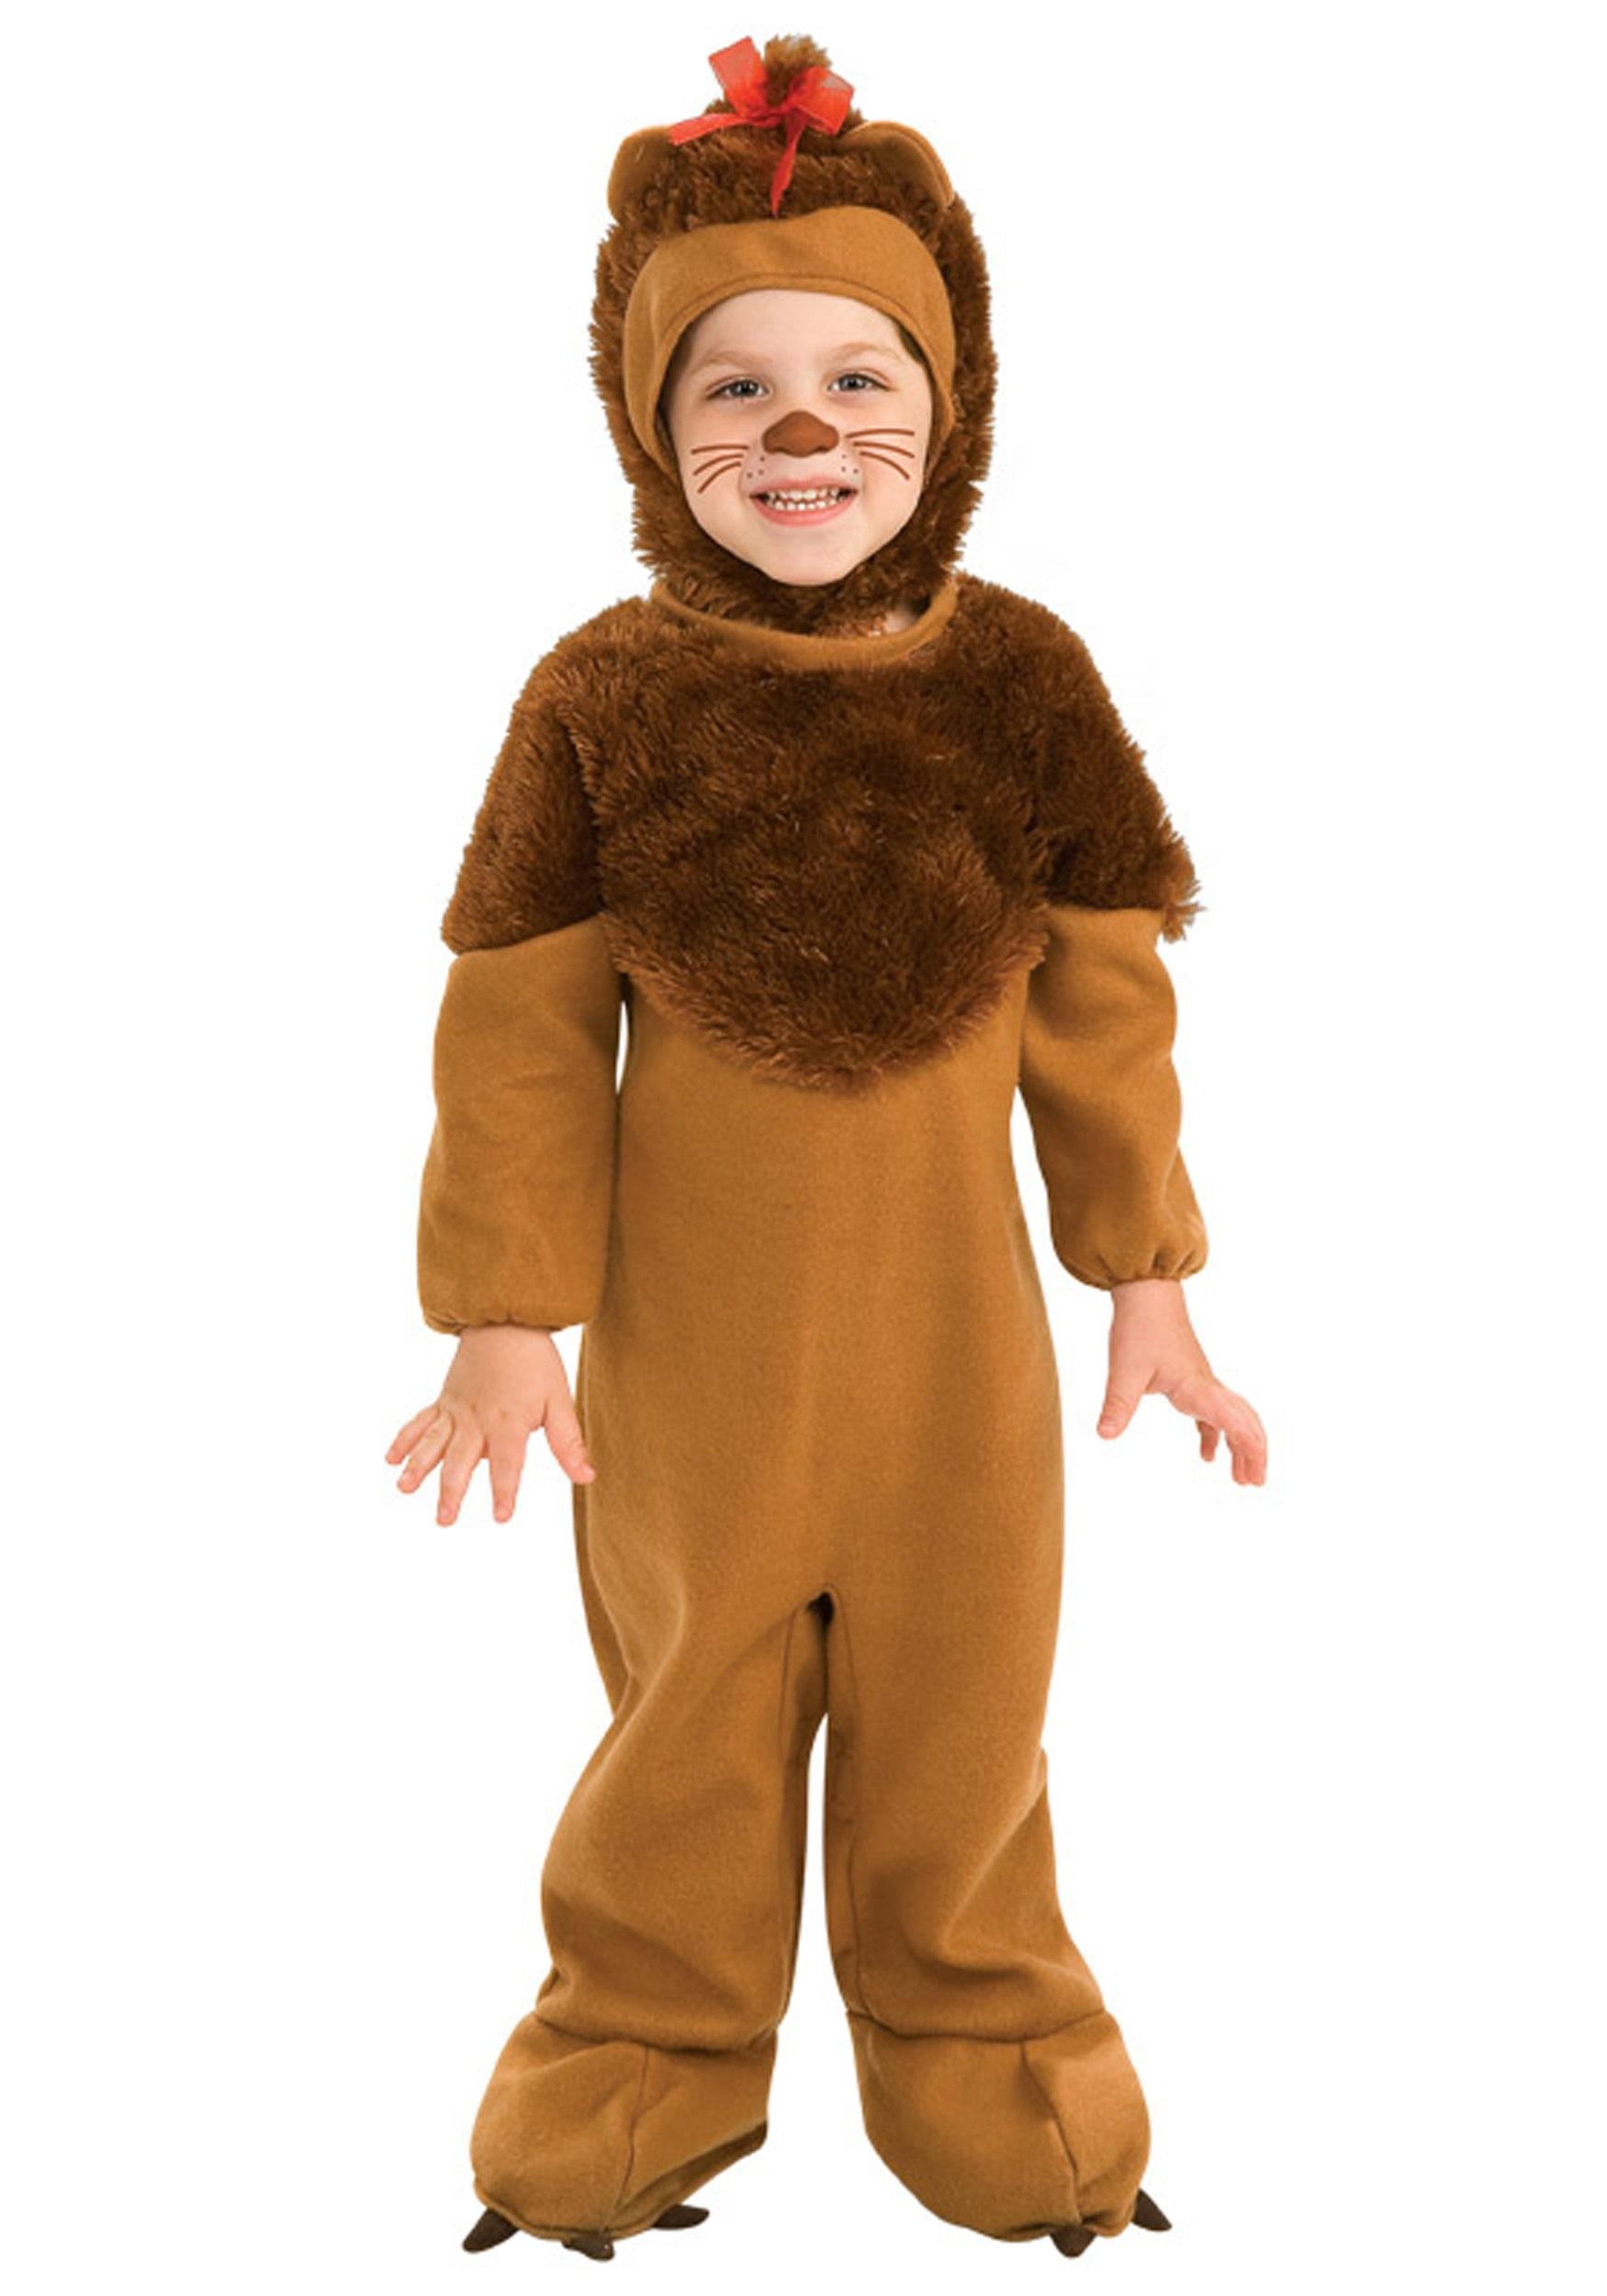 Wizard of Oz Cowardly Lion Costumes - HalloweenCostumes.com